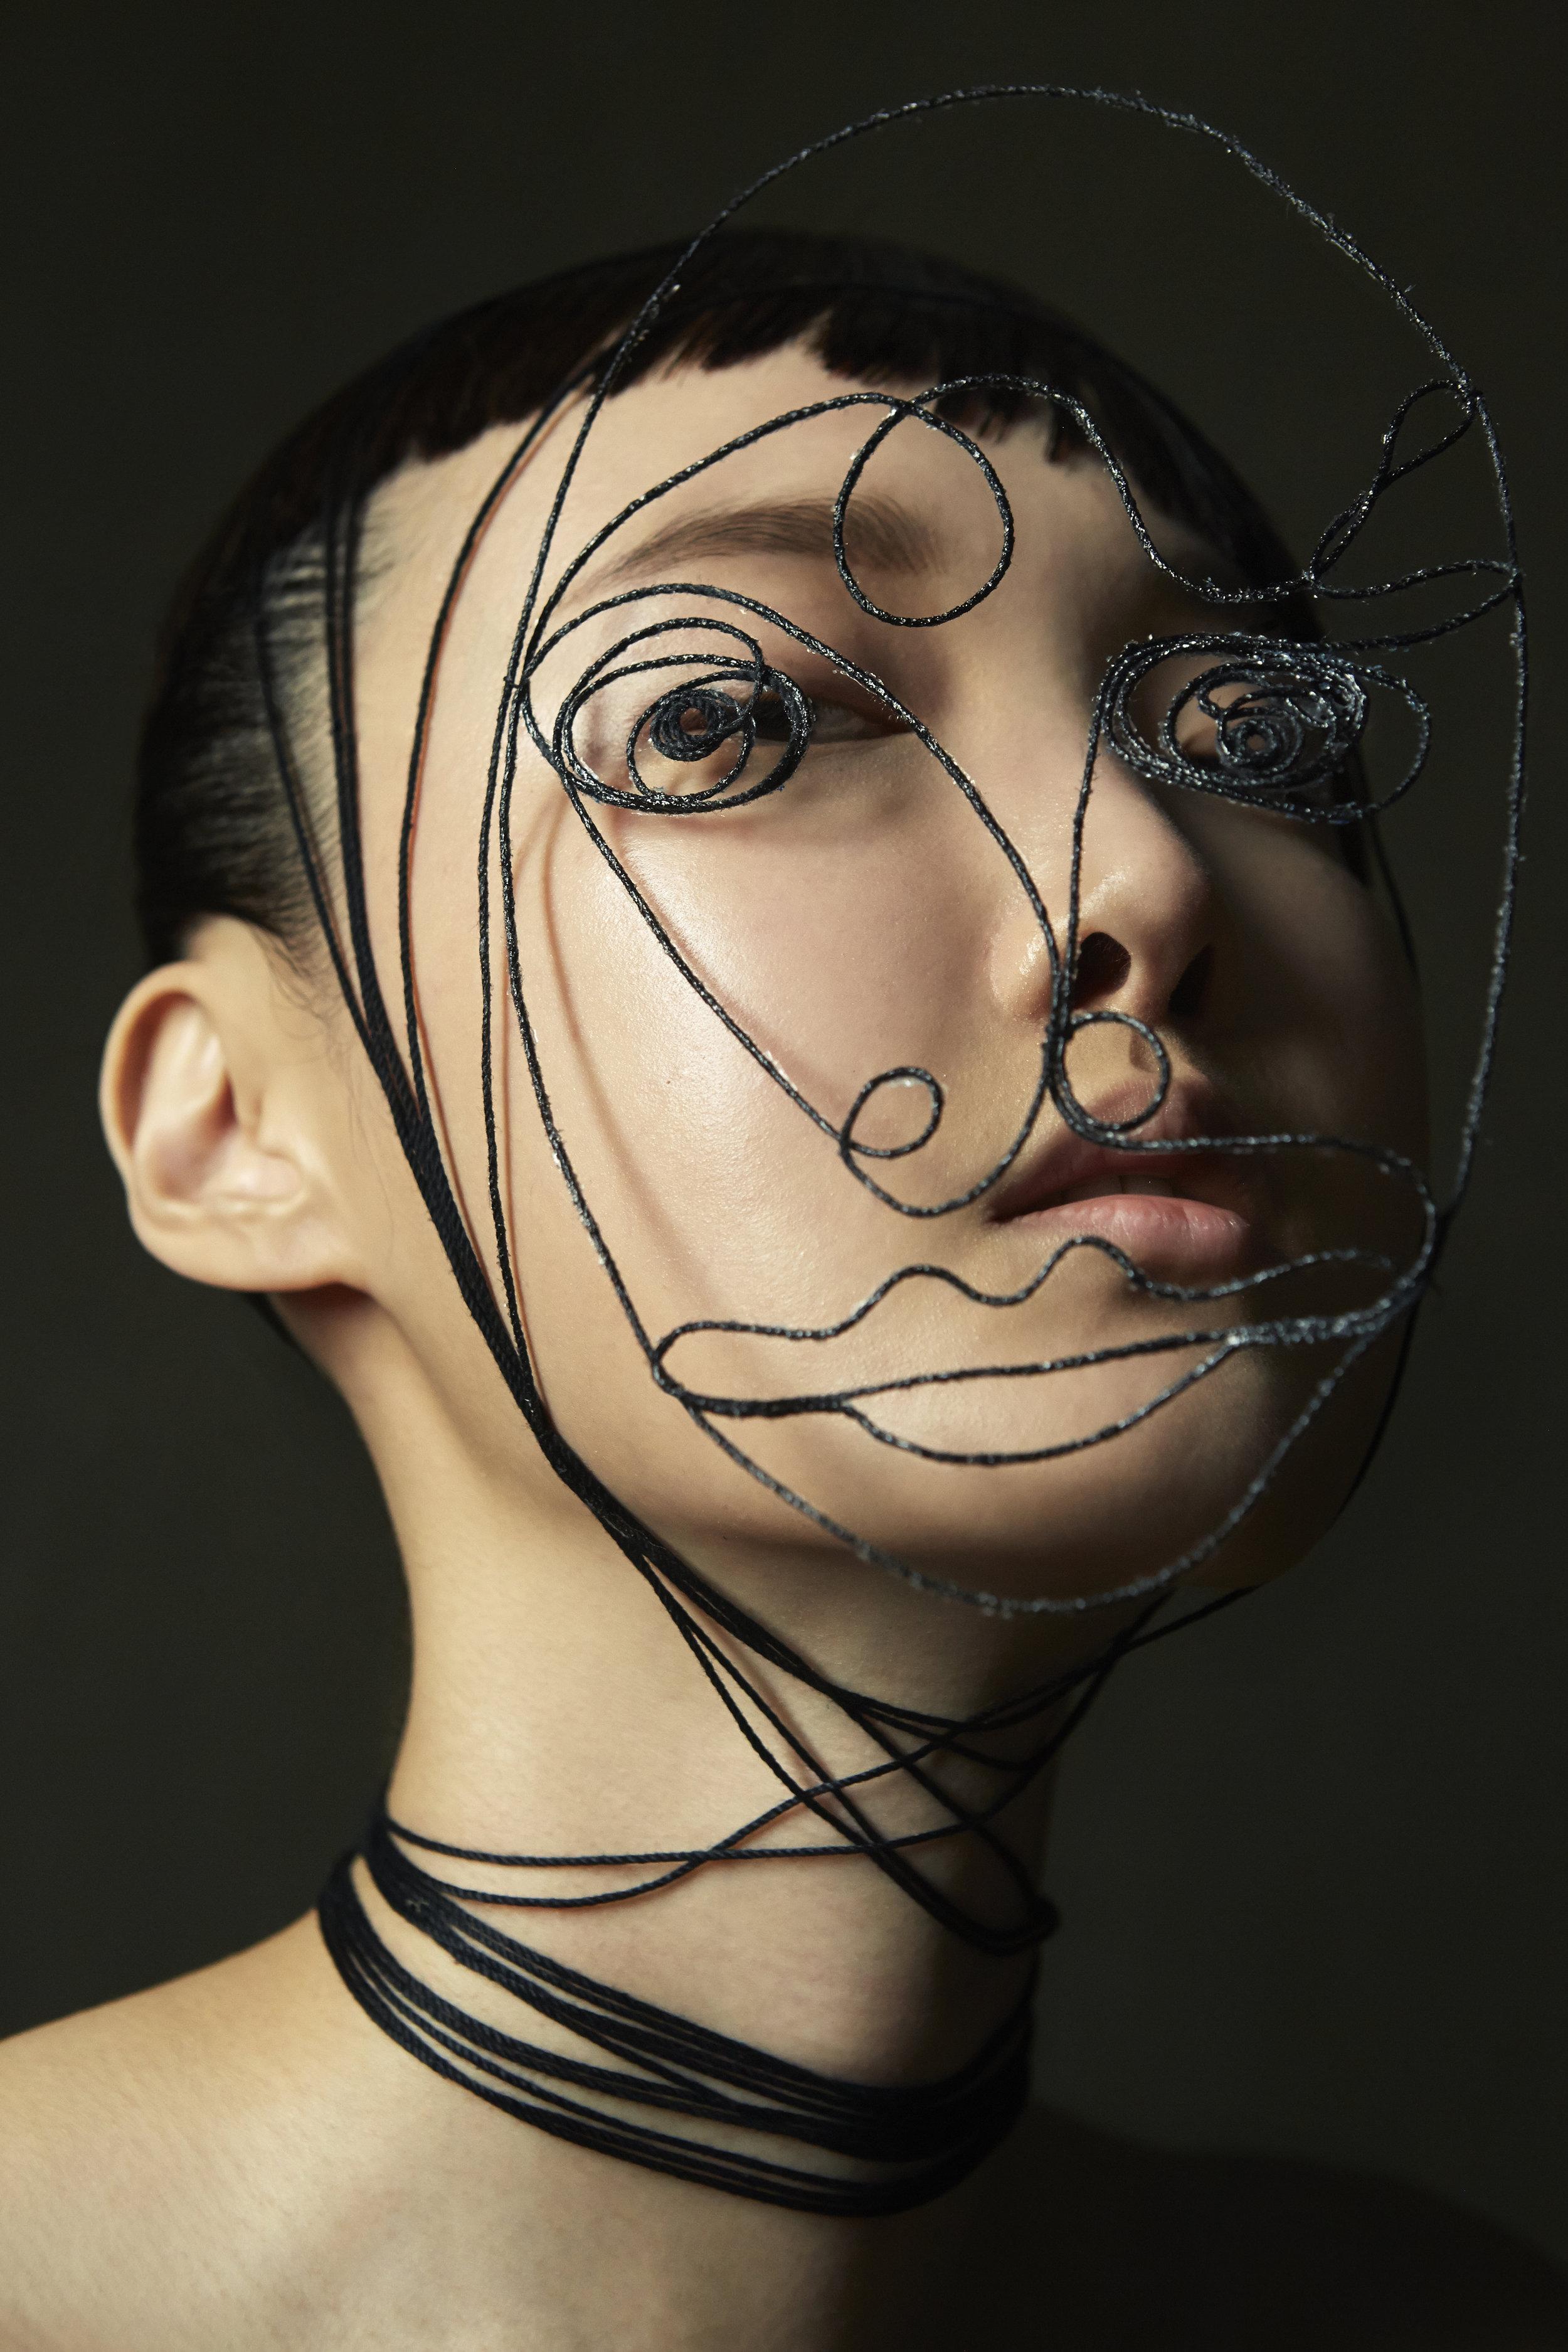 Model: Sujin Park  Make Up Artist: Caitlin Wooters  Hair Stylist: Akihisa Yamaguchi